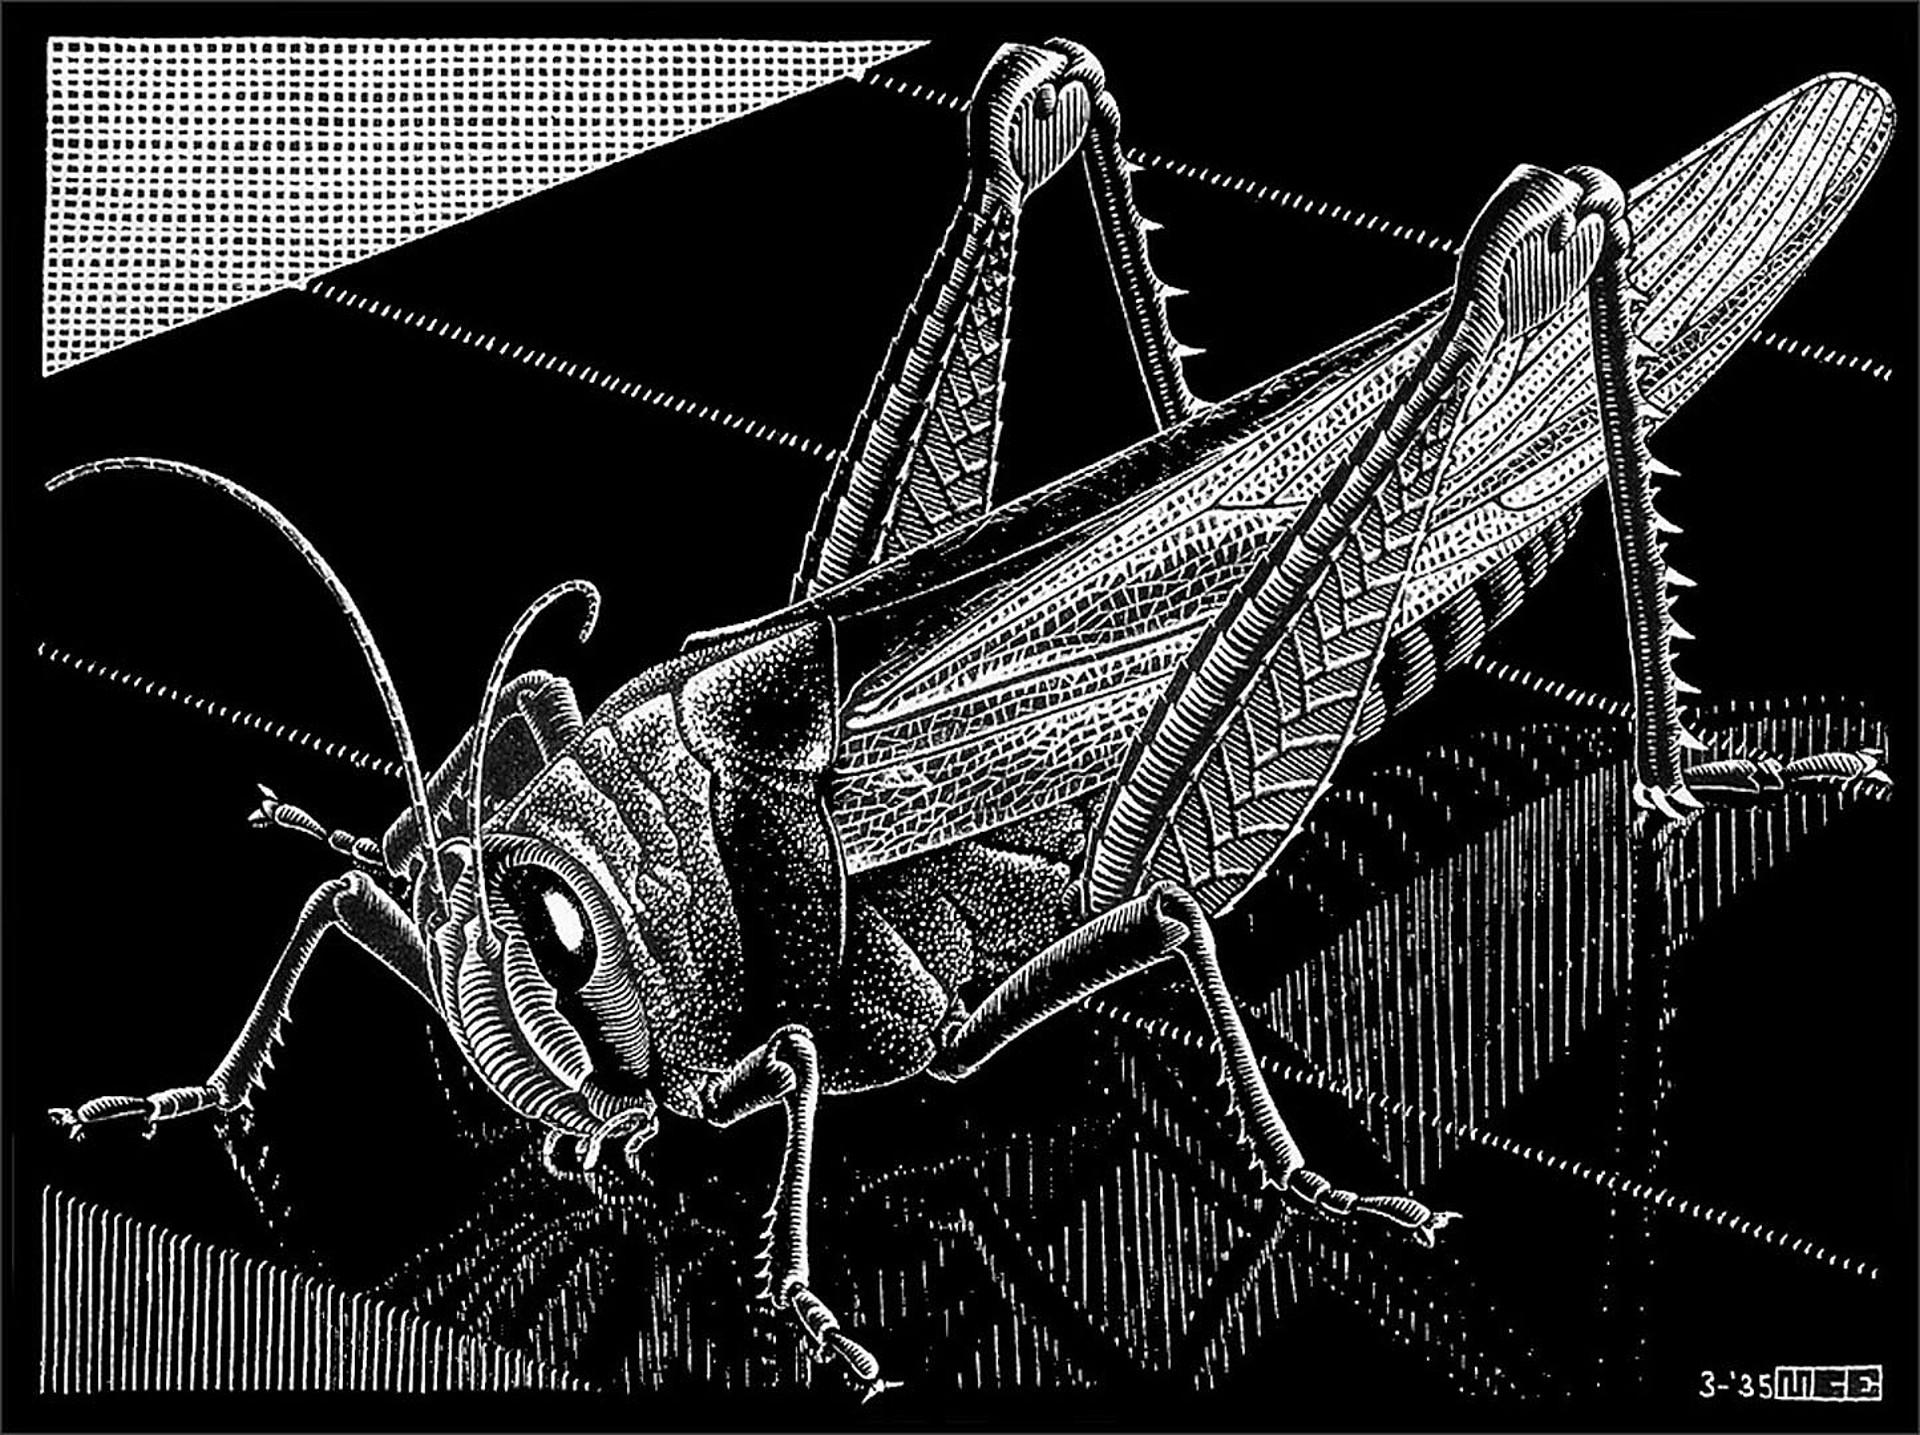 Grasshopper by M.C. Escher